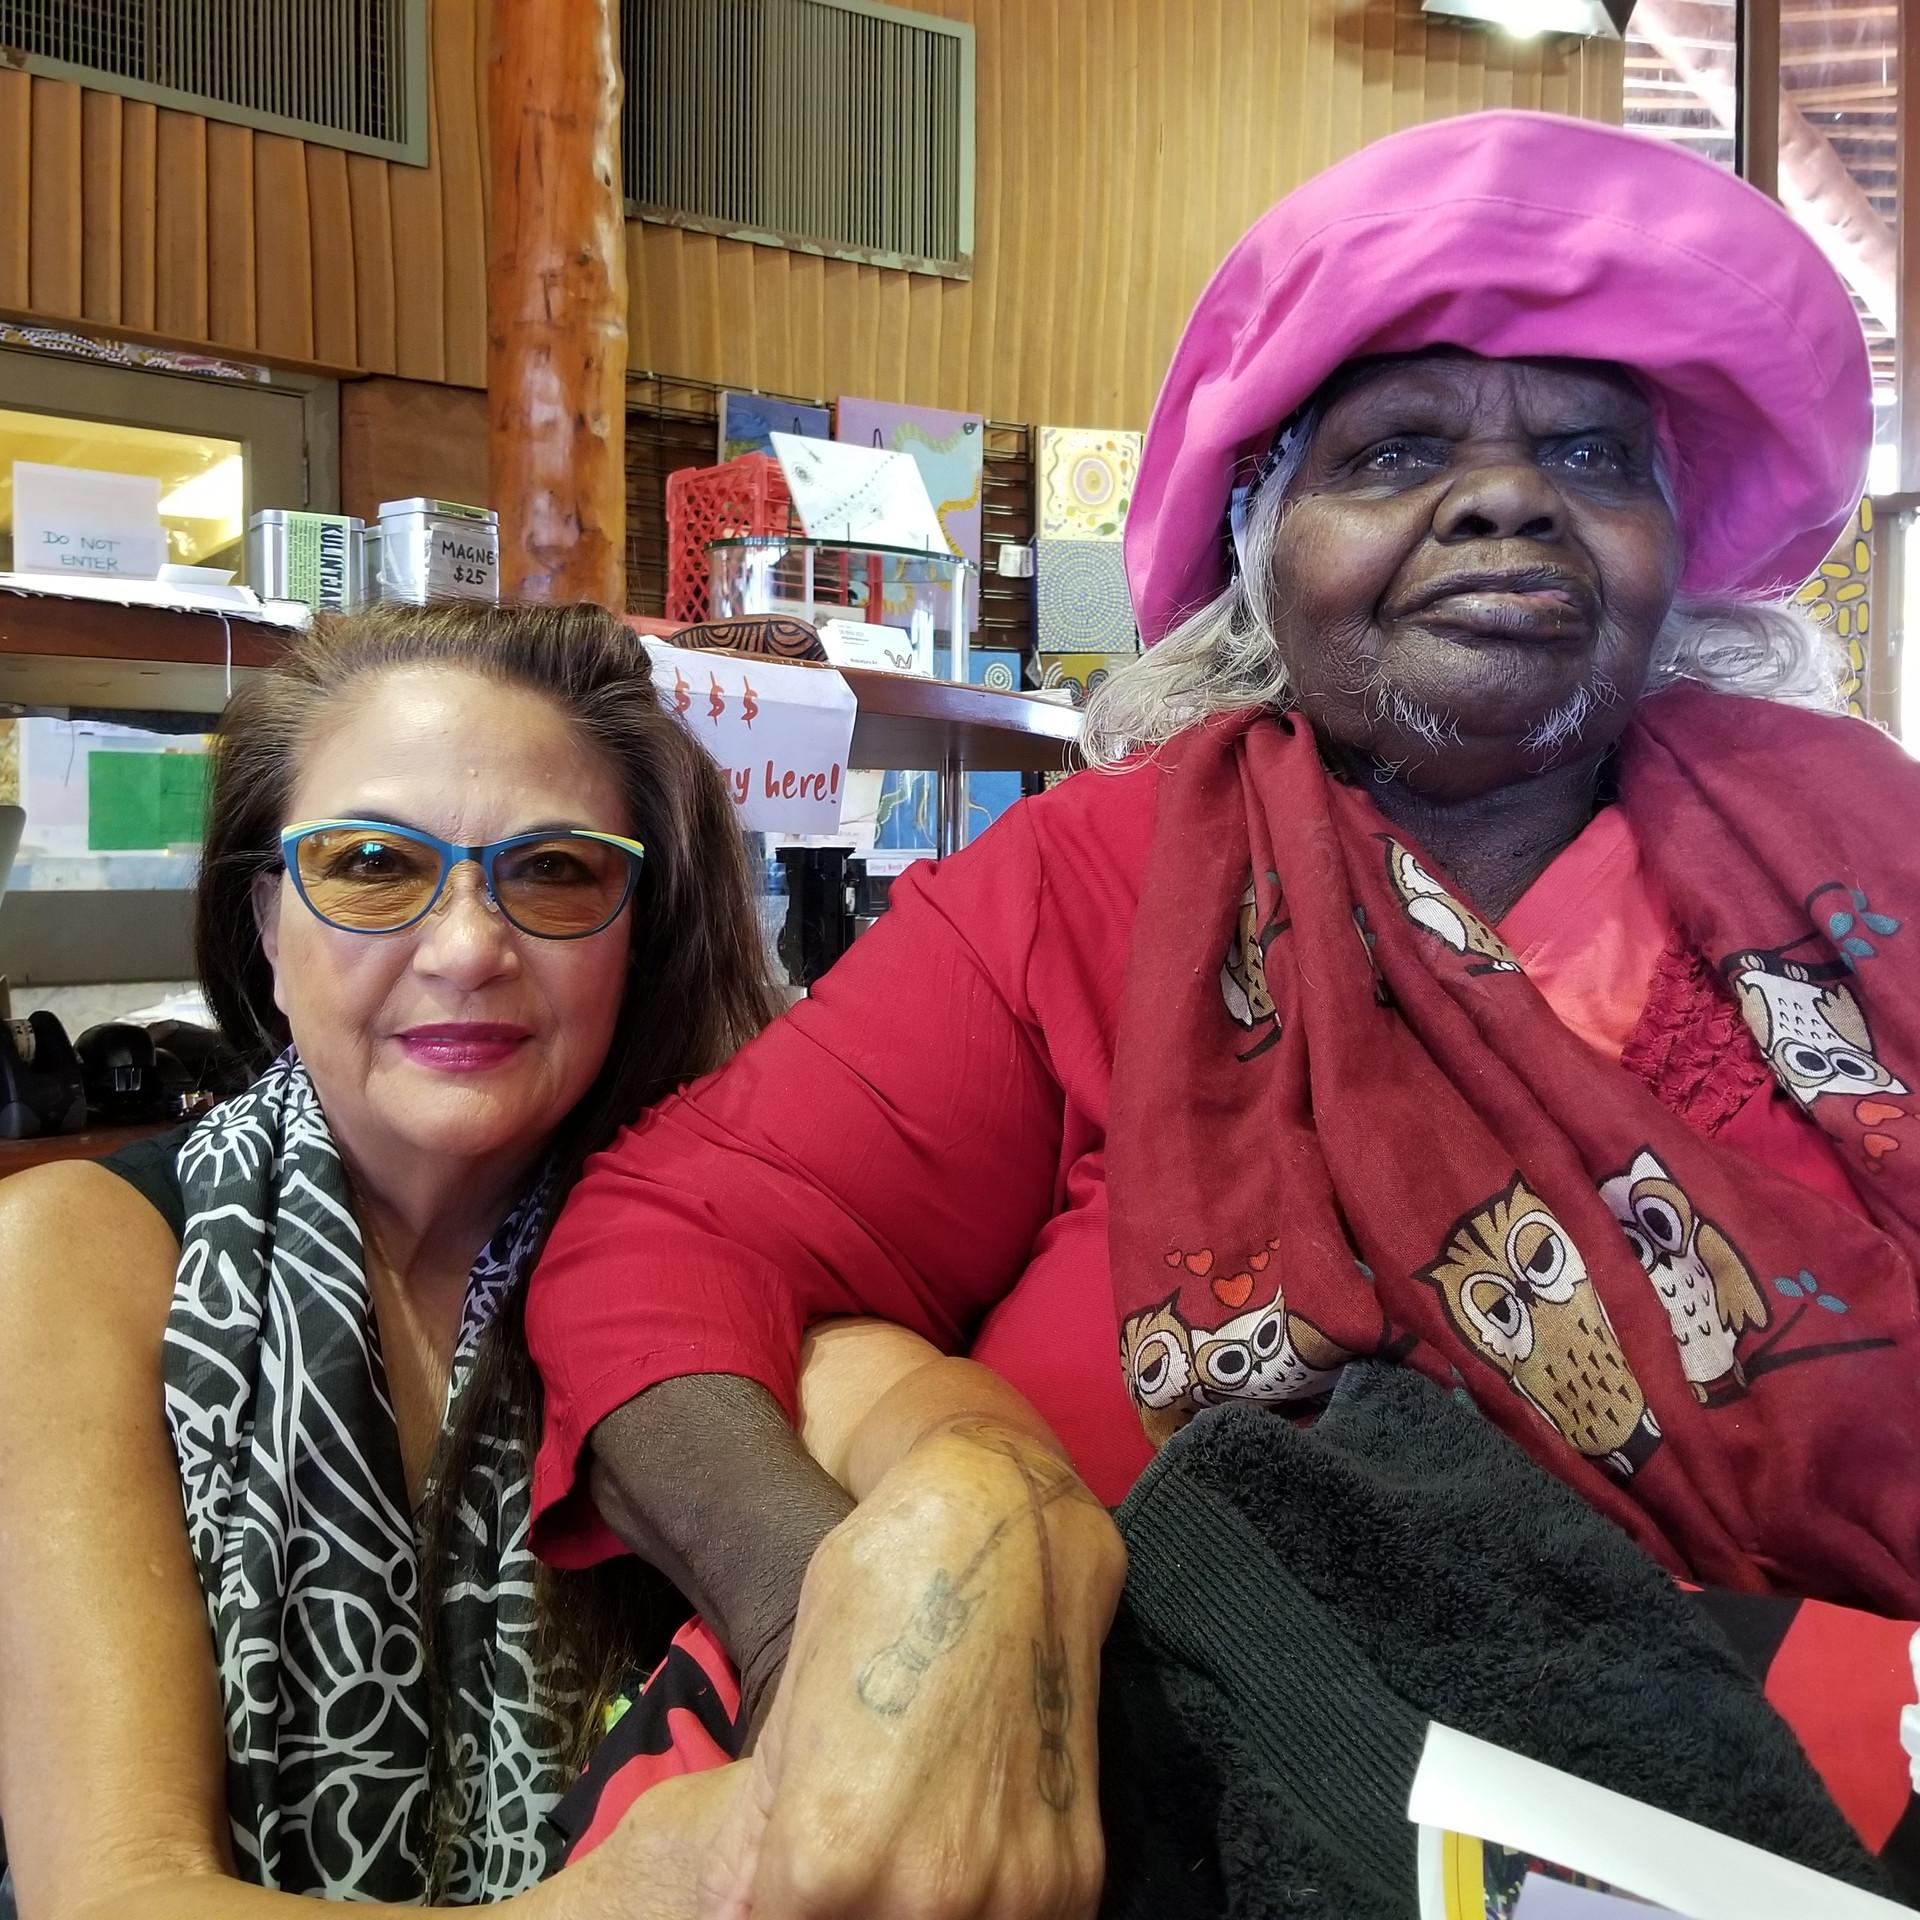 Me and Auntie Nellie, Elder of West Australia